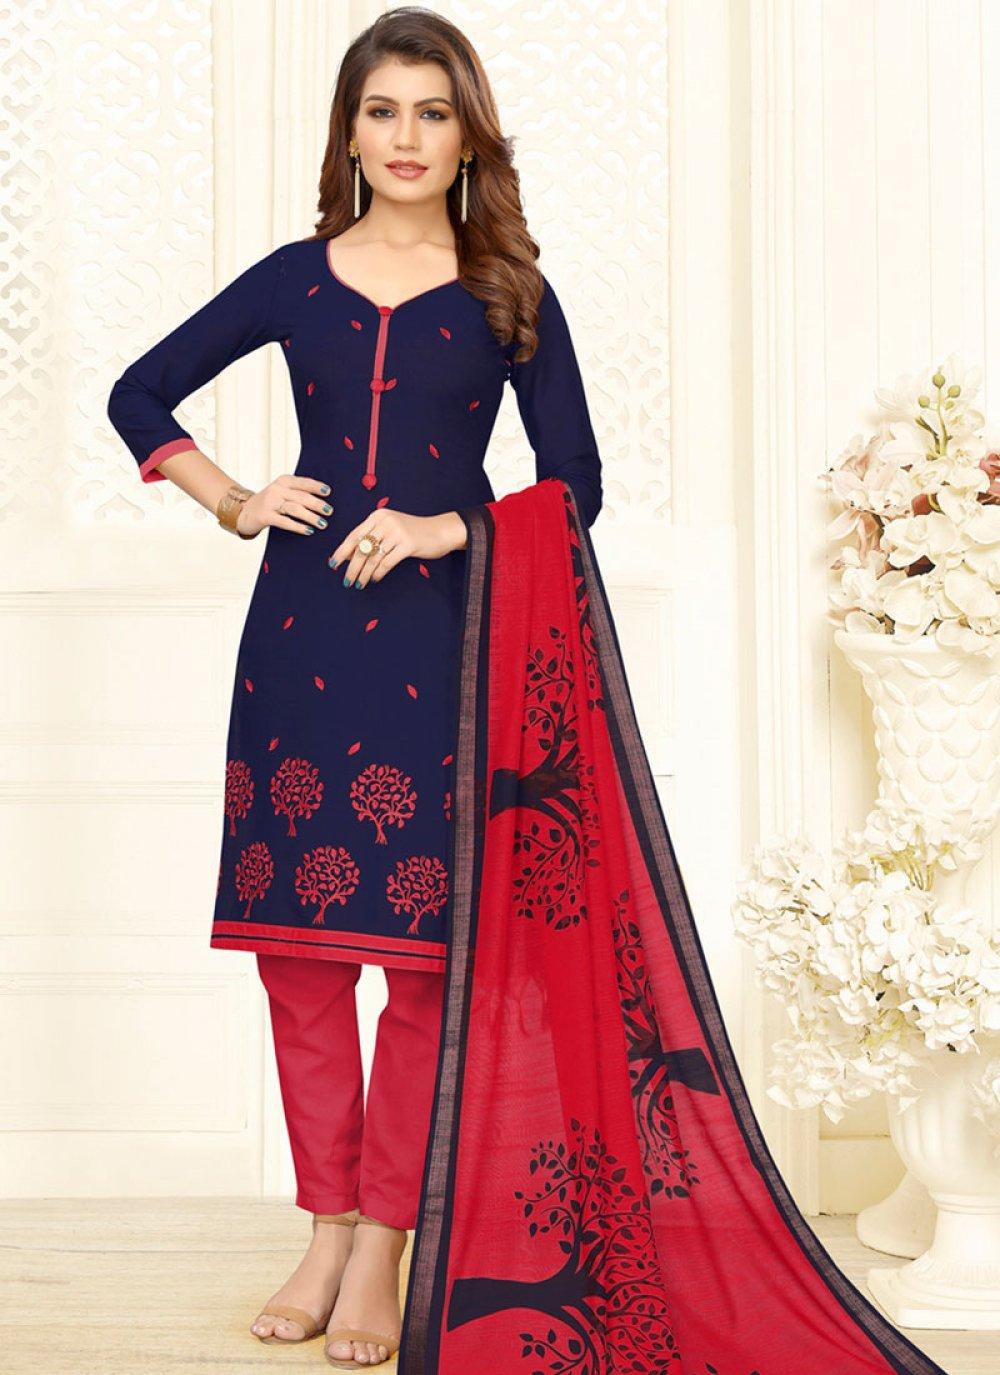 Embroidered Blue and Red Churidar Salwar Kameez